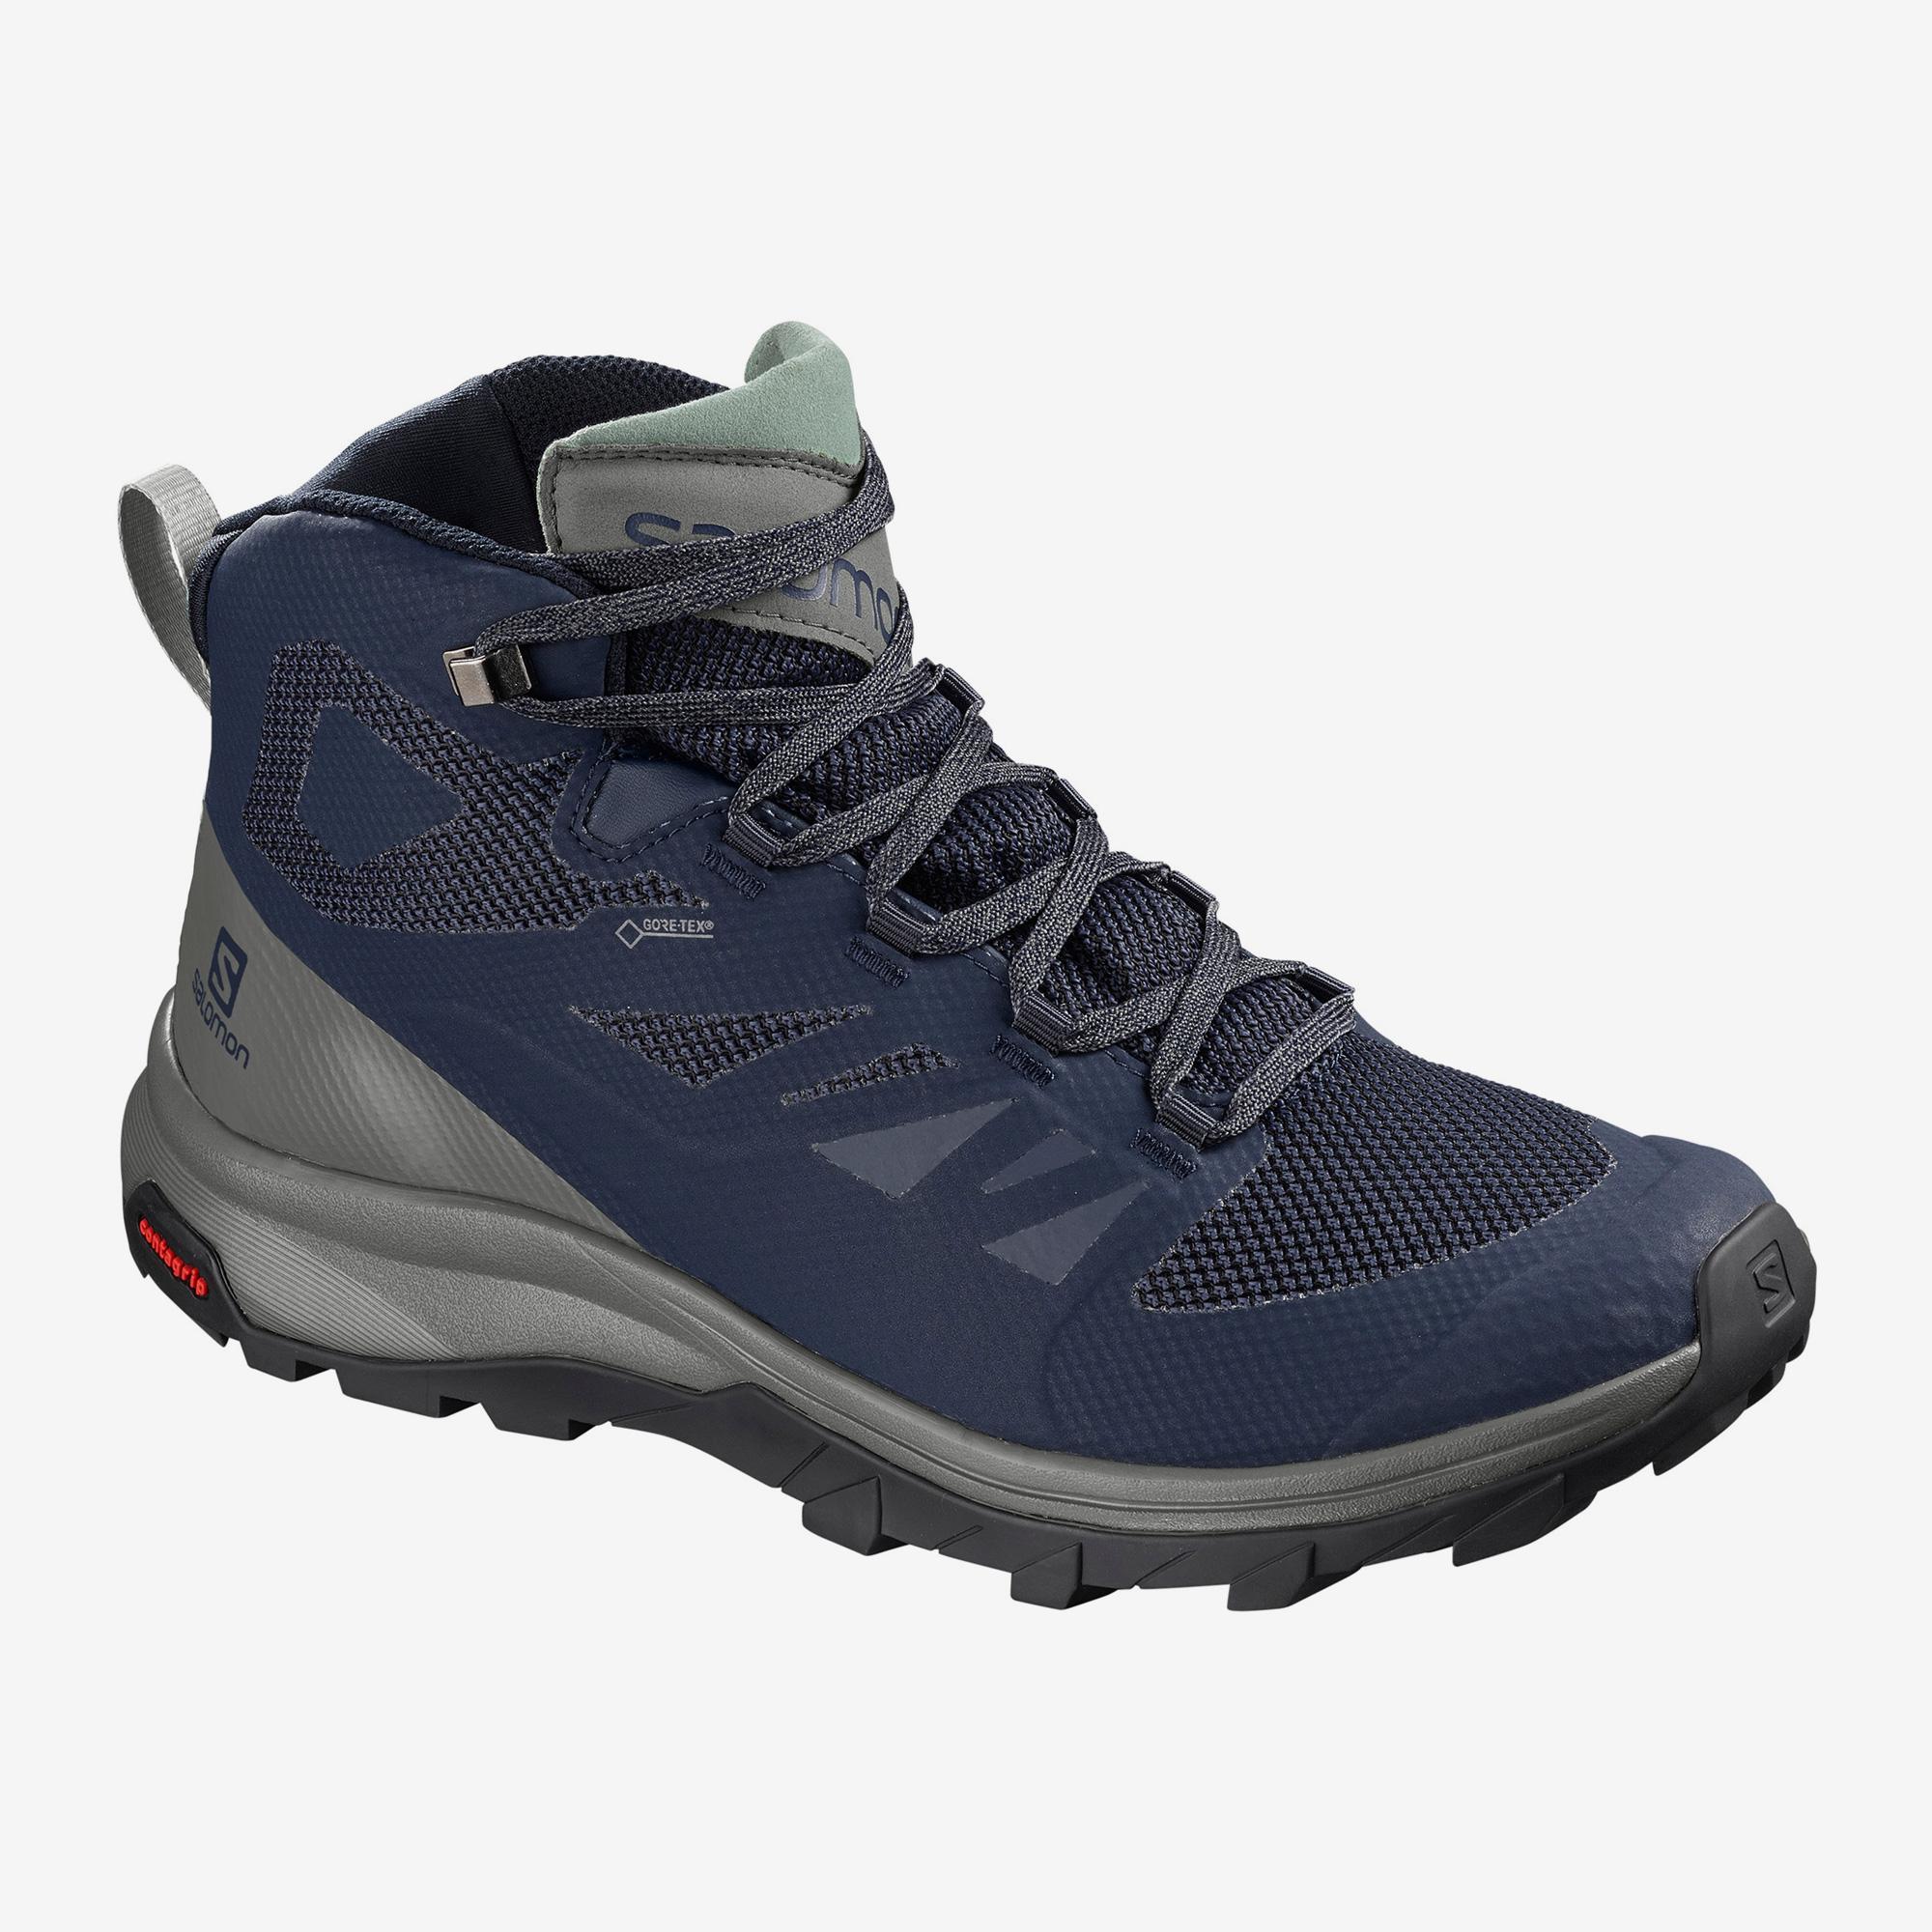 Ботинки мужские OUTline Mid GTX Salomon — фото 1